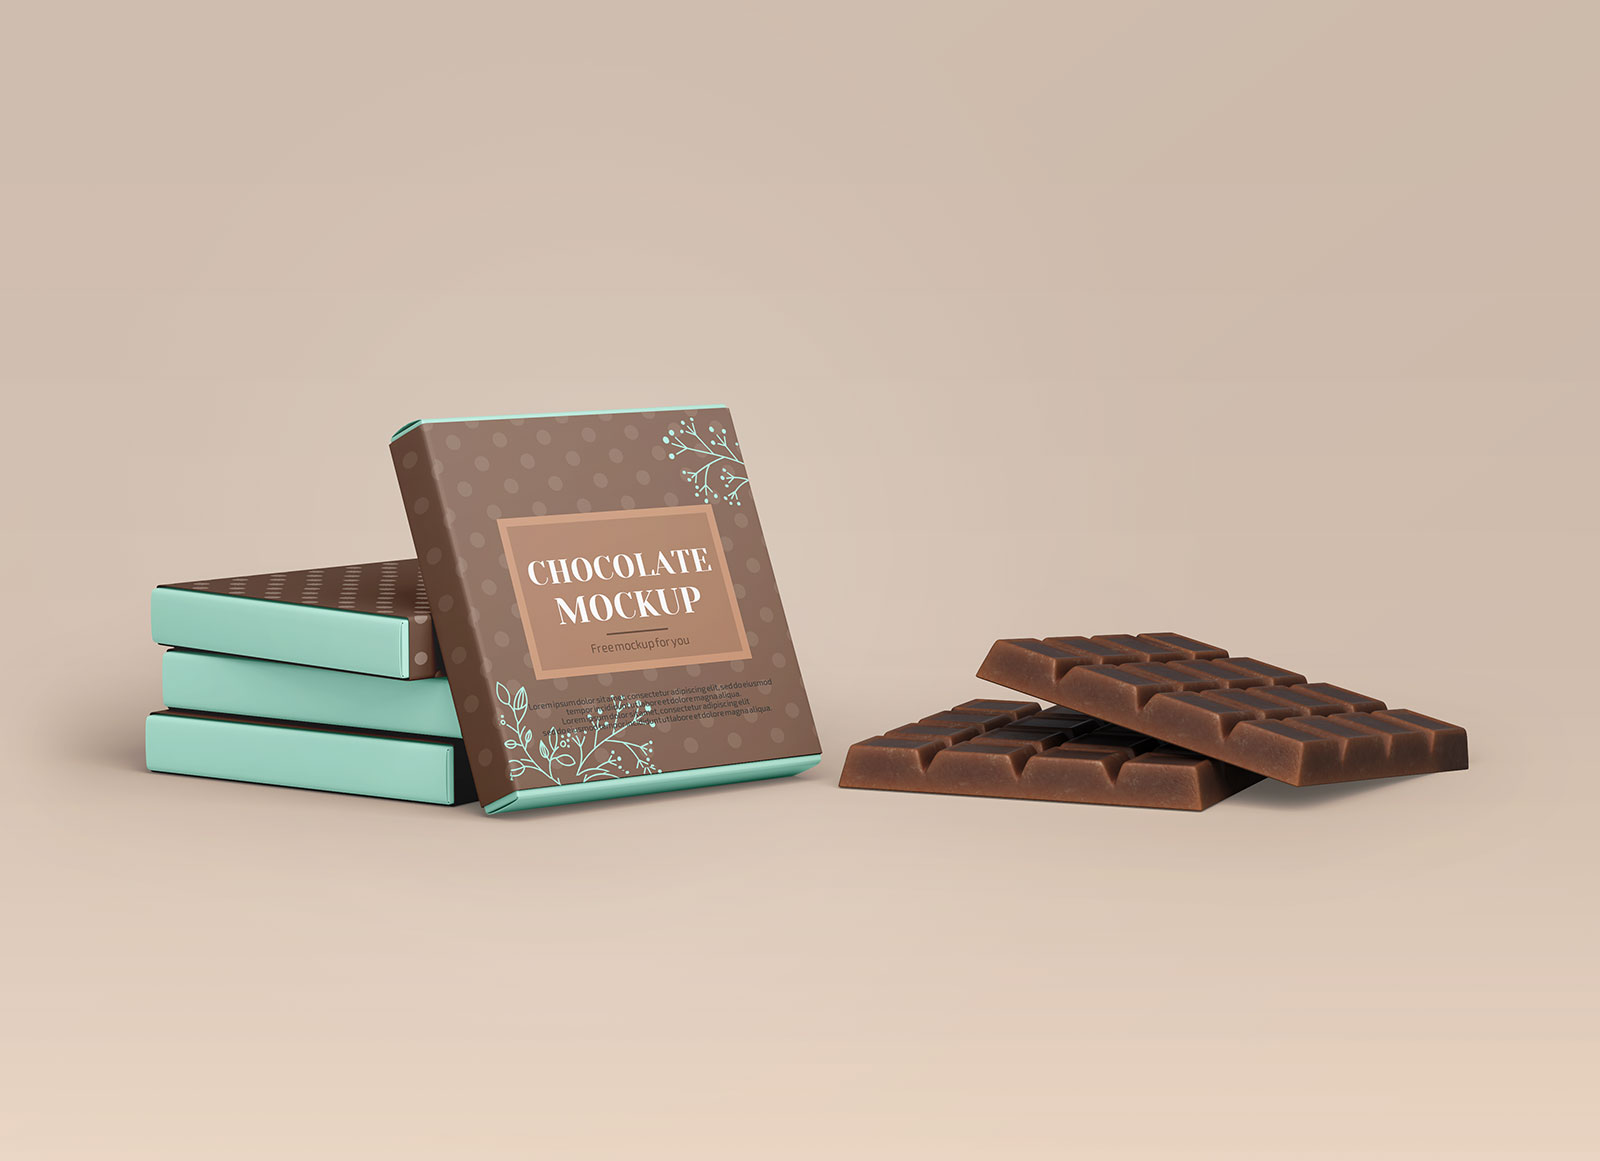 Free-Chocolate-Bar-Packaging-Mockup-PSD-Set-2